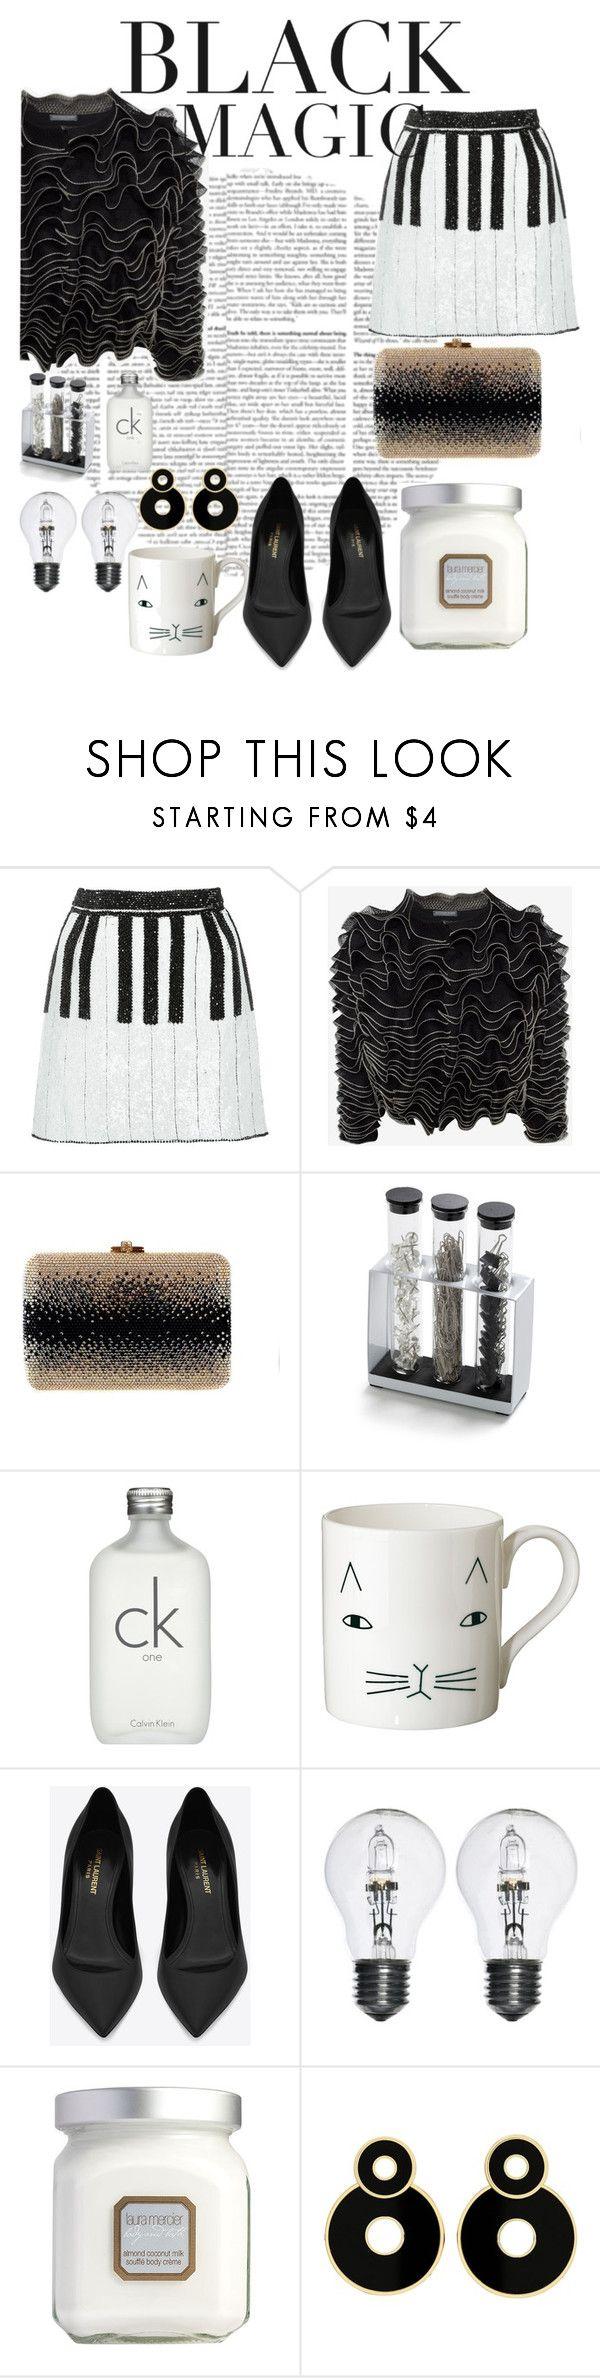 """Black magic"" by kingaflp ❤ liked on Polyvore featuring Dolce&Gabbana, Alexander McQueen, Leiber, Lab, Calvin Klein, Donna Wilson, MANGO, Yves Saint Laurent and Laura Mercier"